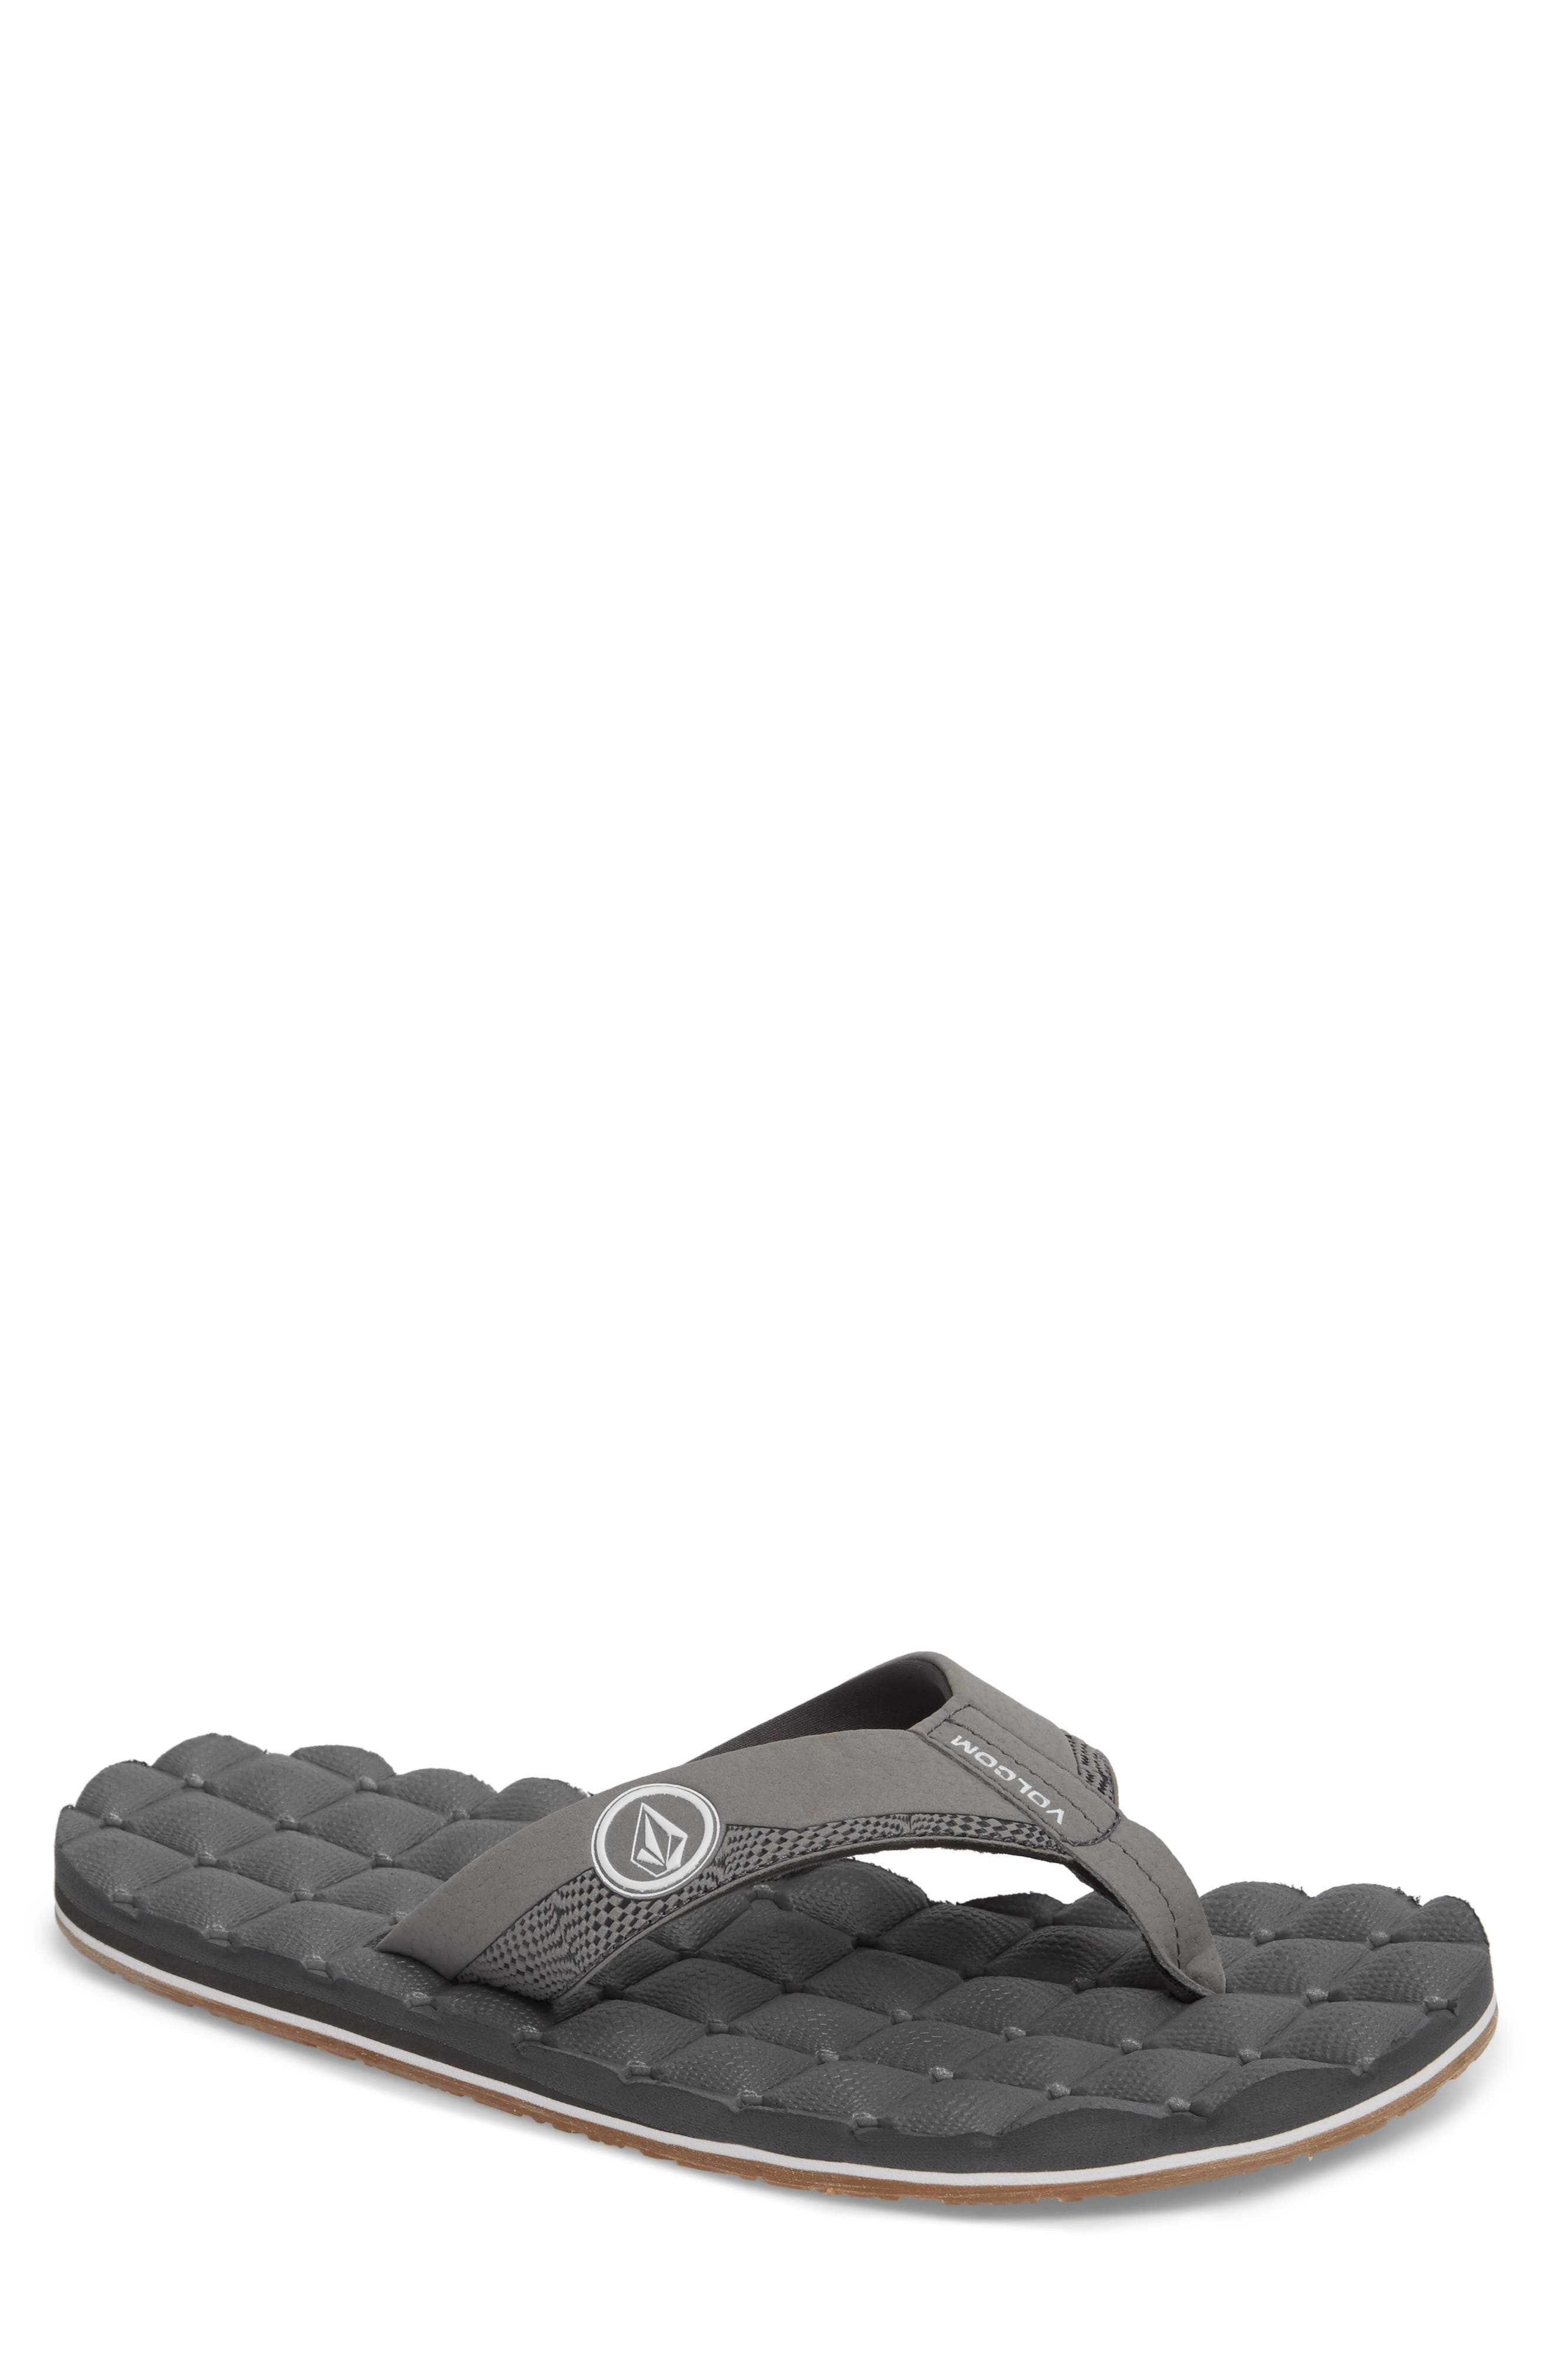 'Recliner' Flip Flop,                             Main thumbnail 1, color,                             Light Grey